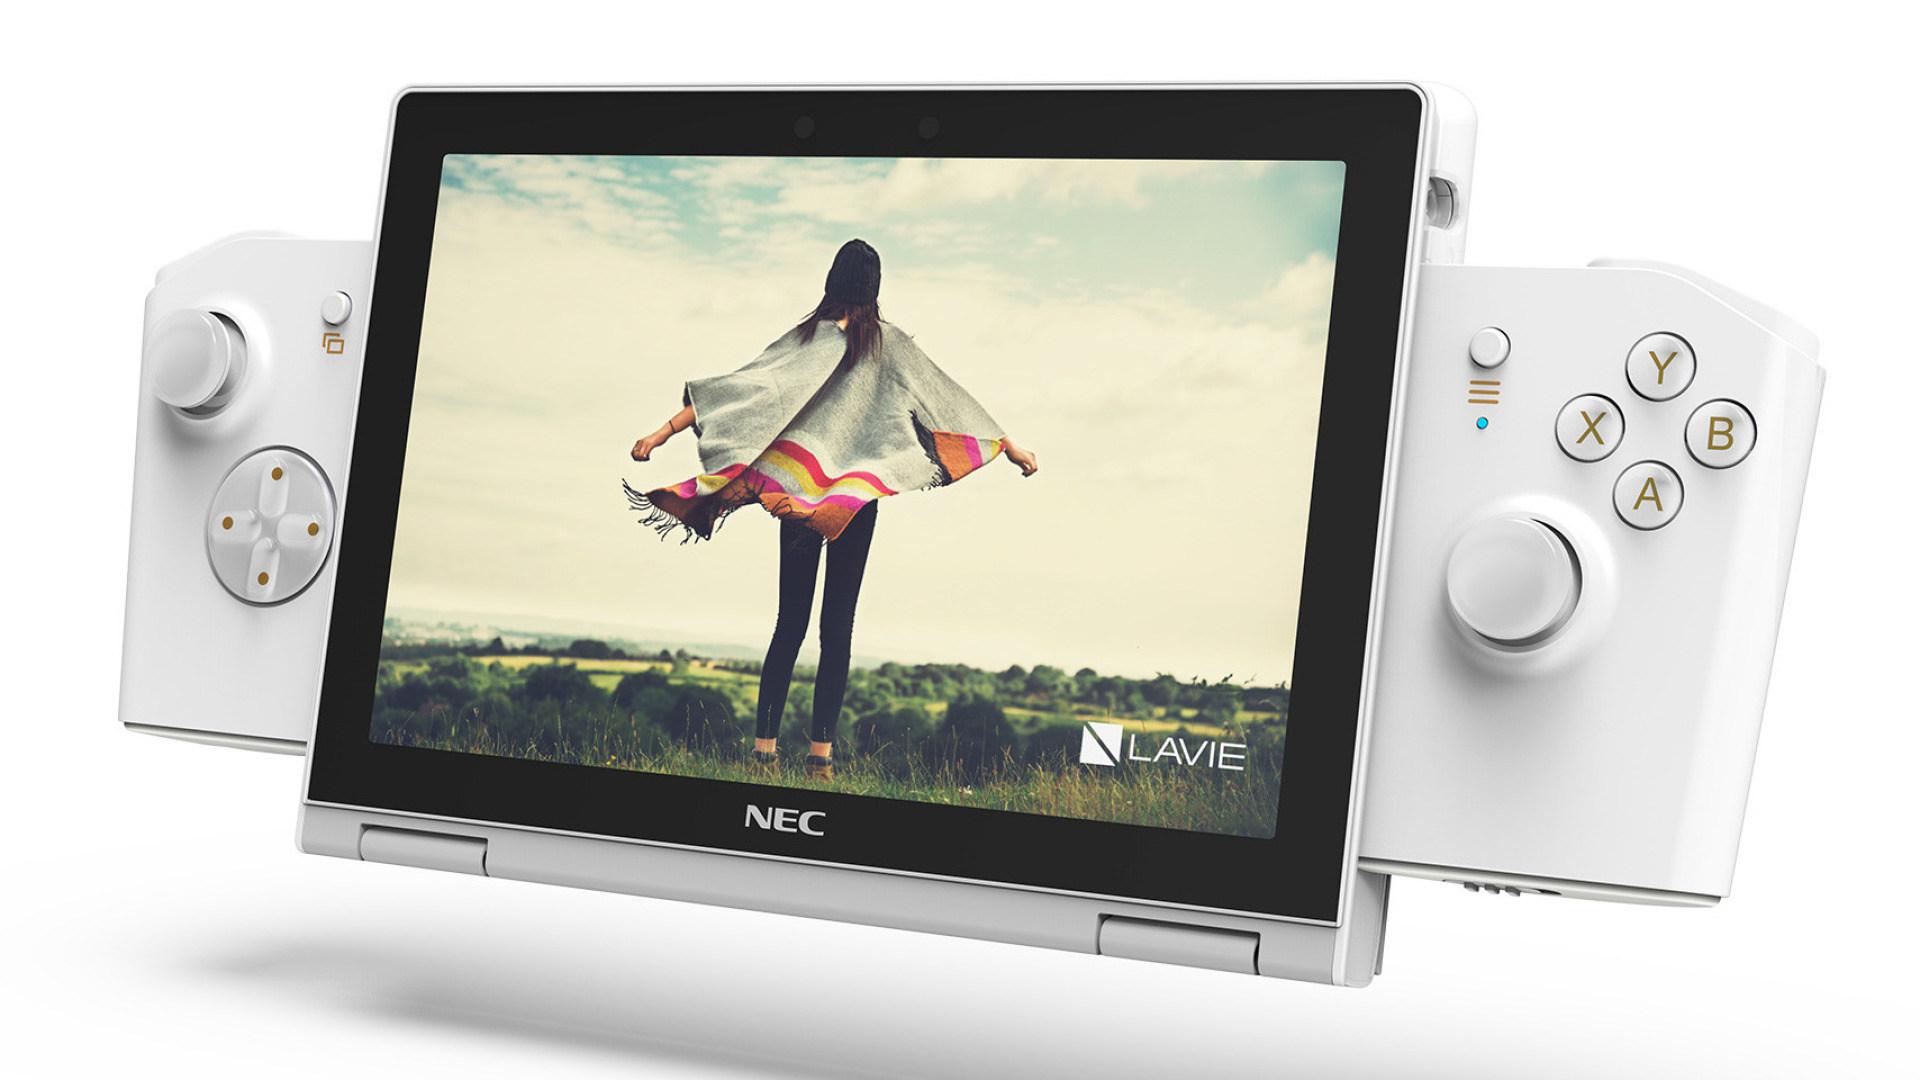 Gaming, Spielkonsole, Pc, Notebook, Laptop, Lenovo, Konzept, Netbook, NEC Lavie Mini